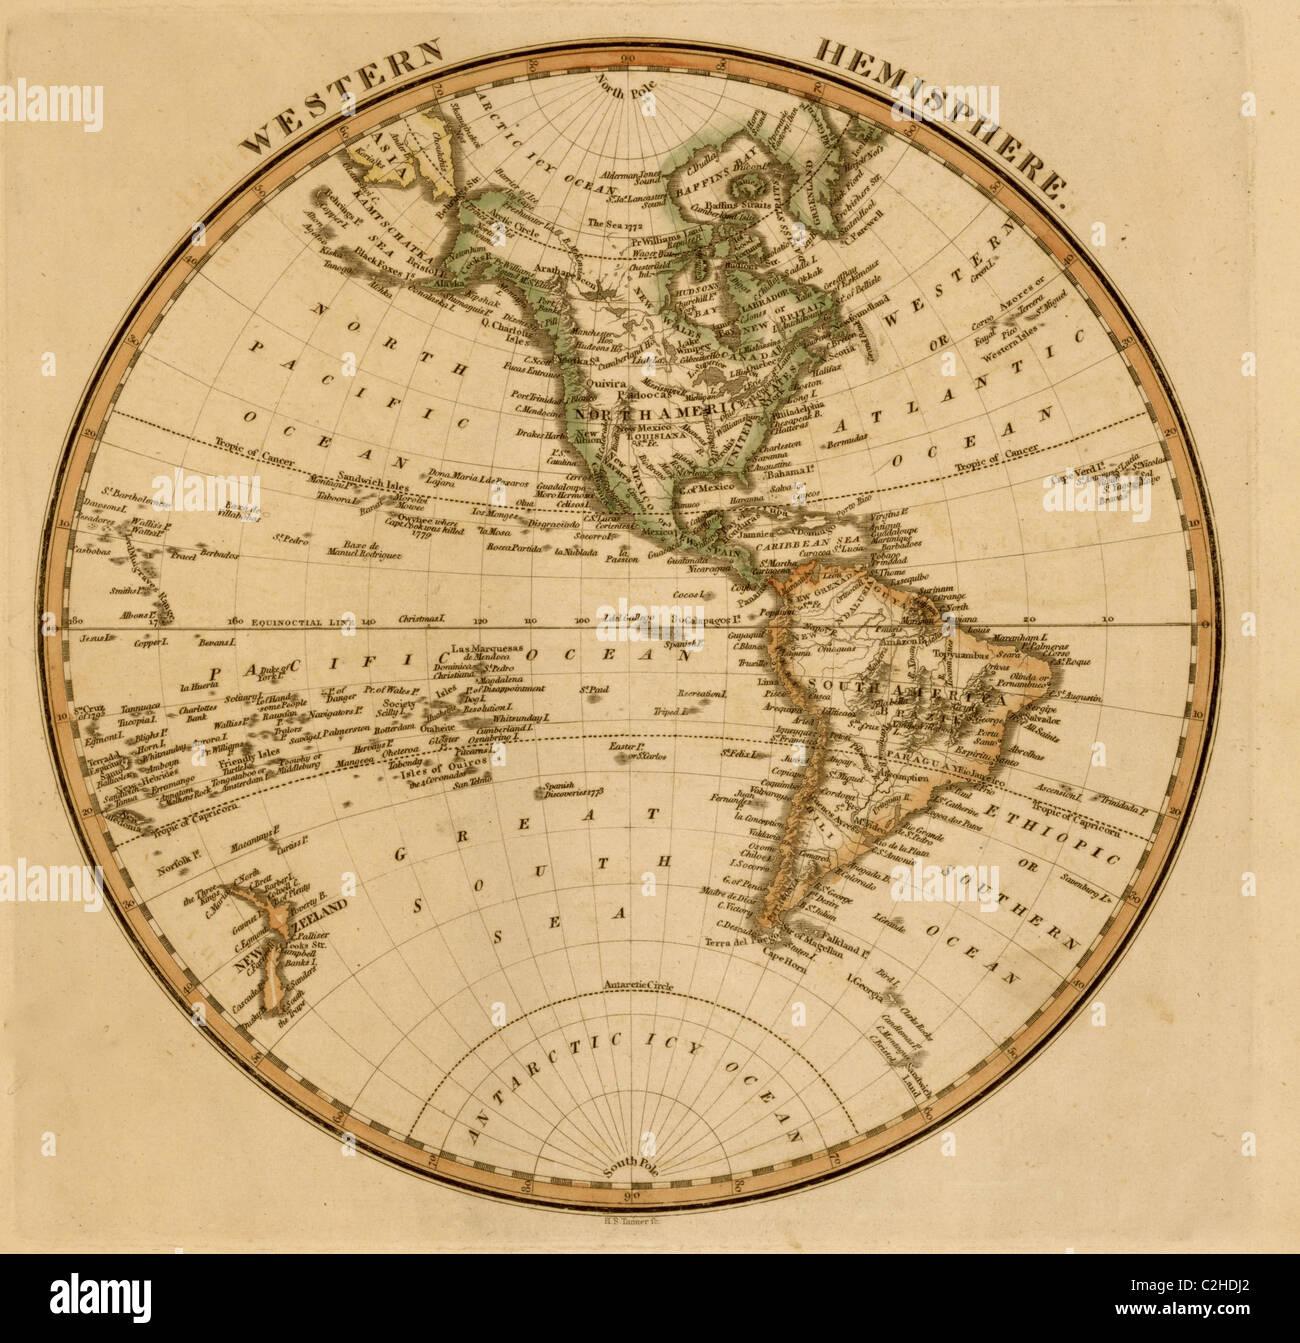 Western Hemisphere -1817 - Stock Image